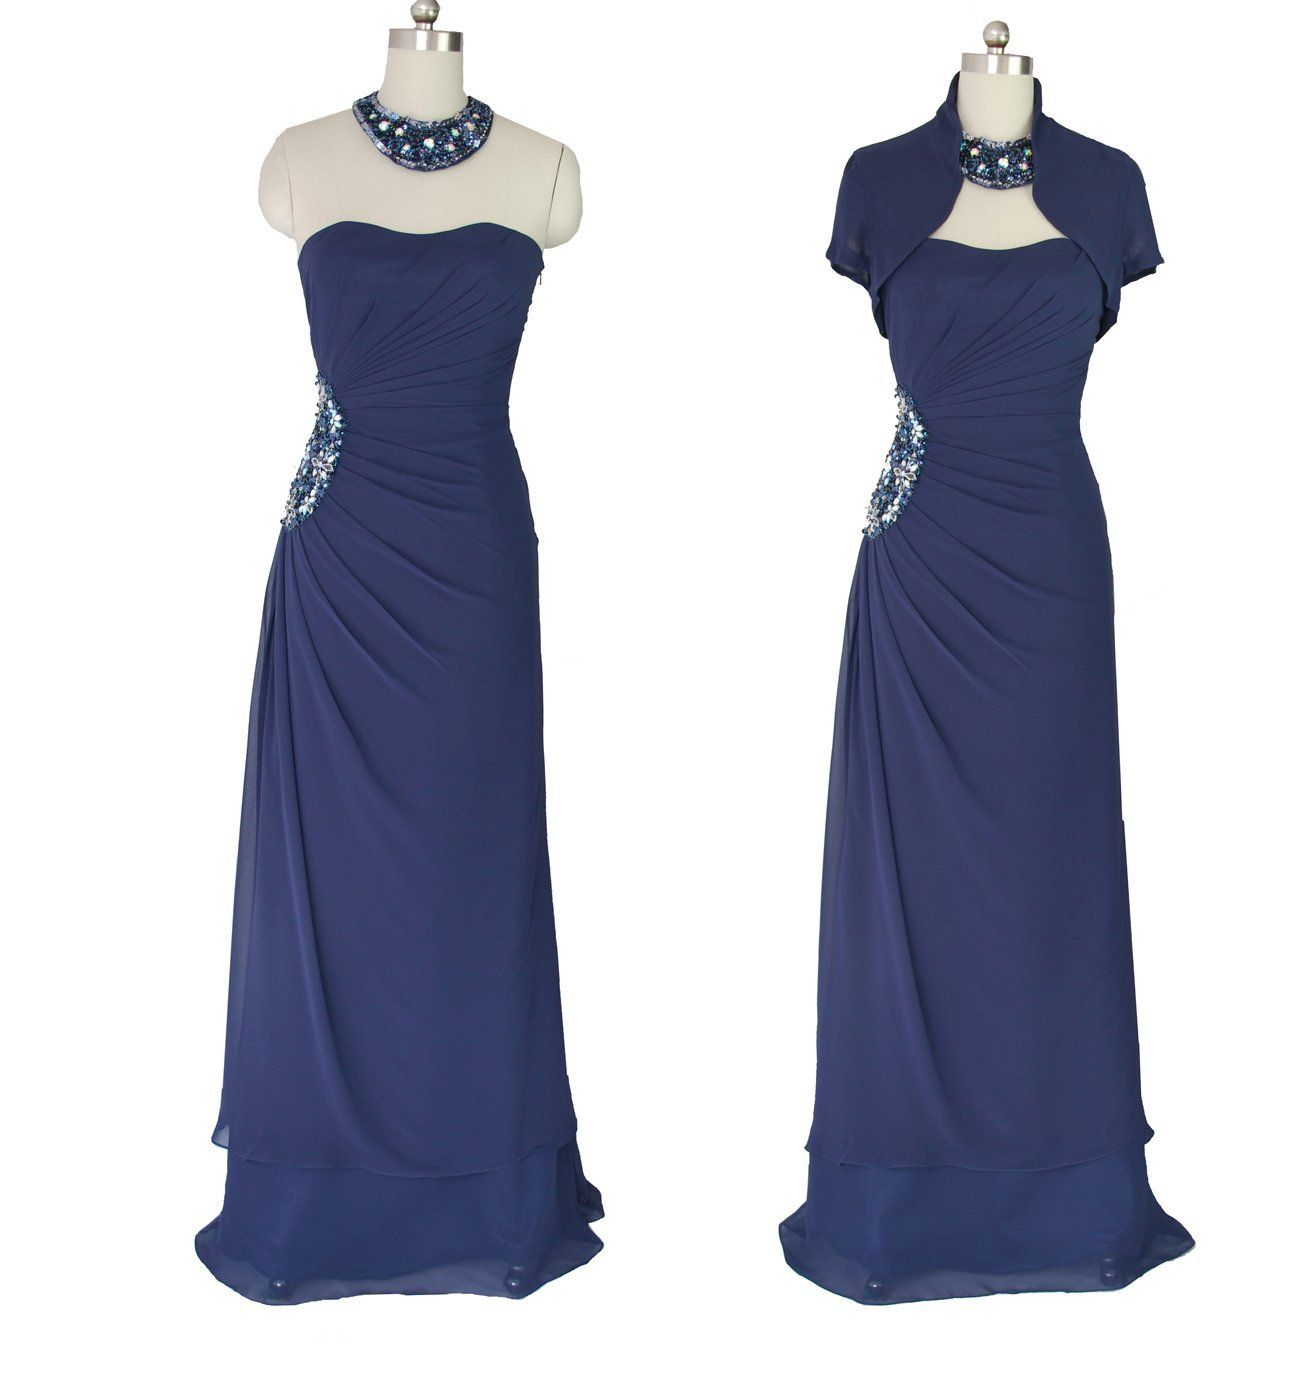 Evening Gown | 1280NV Qpid Showgirl Navy Blue Chiffon dress Choker Bolero Bridesmaid ...